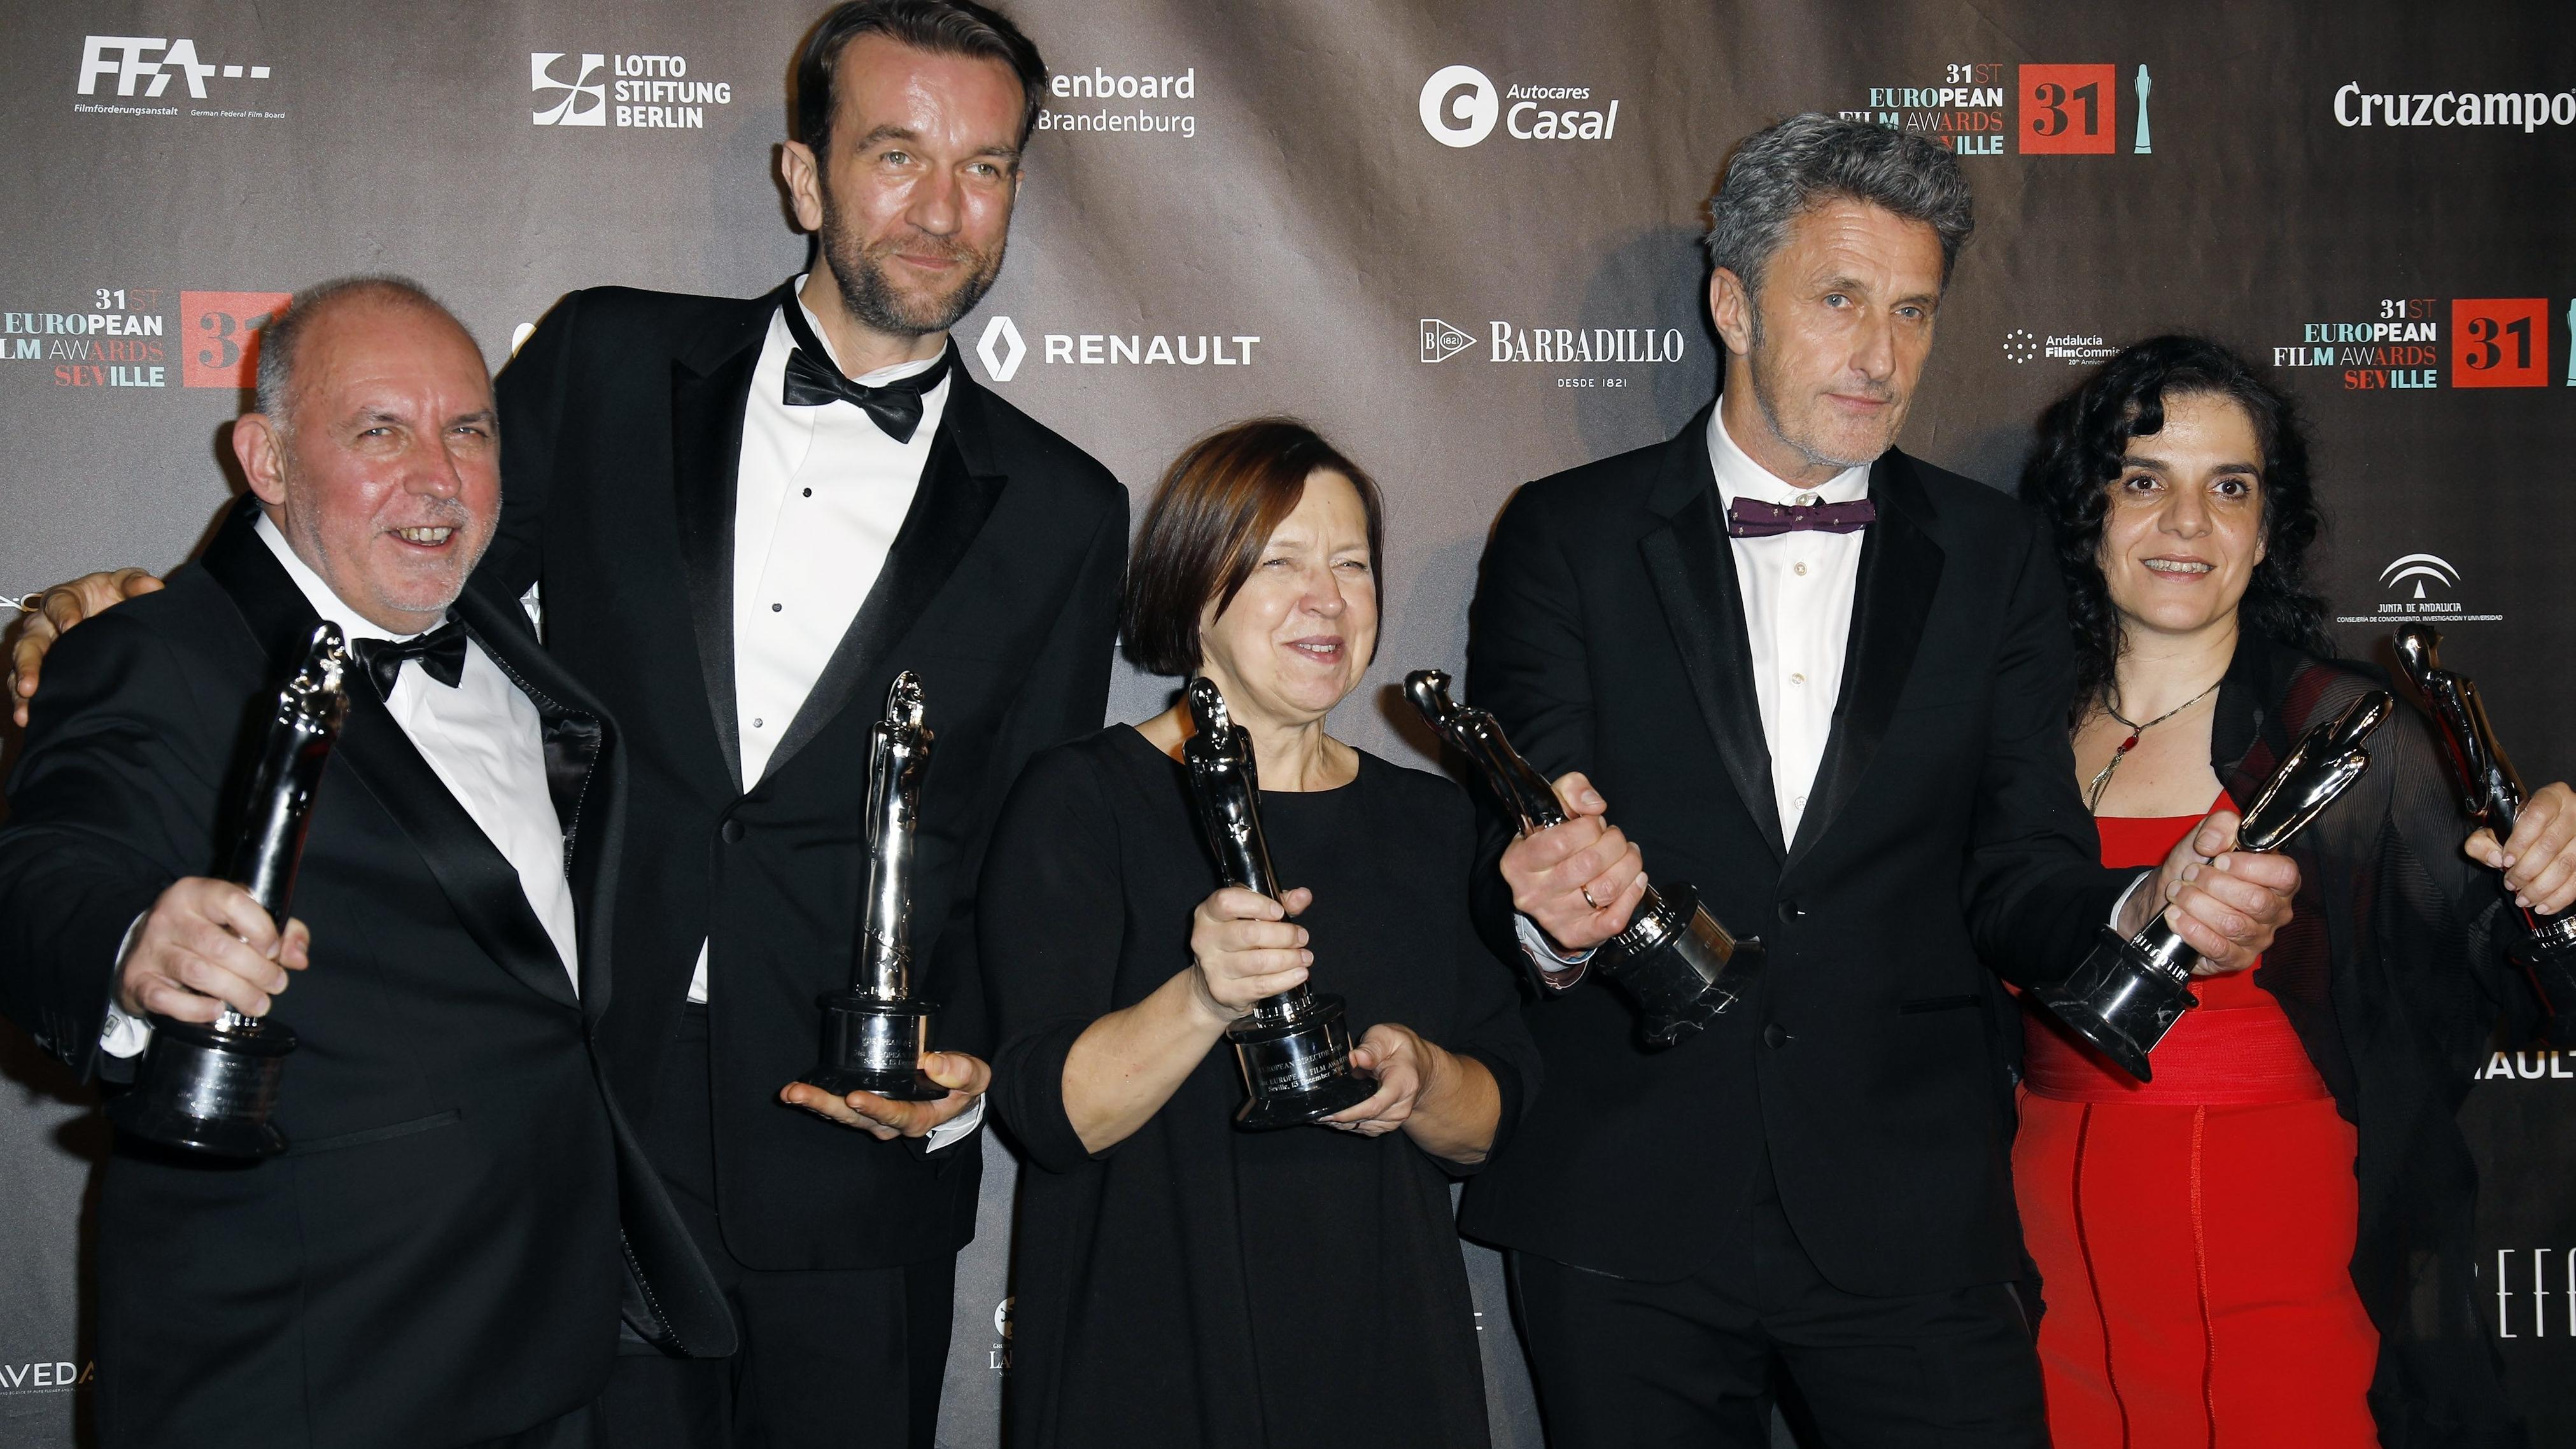 Jaroslaw Kaminski, Tomasz Kot, Ewa Puszczynska, Pawel Pawlikowski und Tanya Seghatchian bei der Verleihung des 31. Europäischen Filmpreises 2018 im Teatro de la Maestranza in Sevilla.